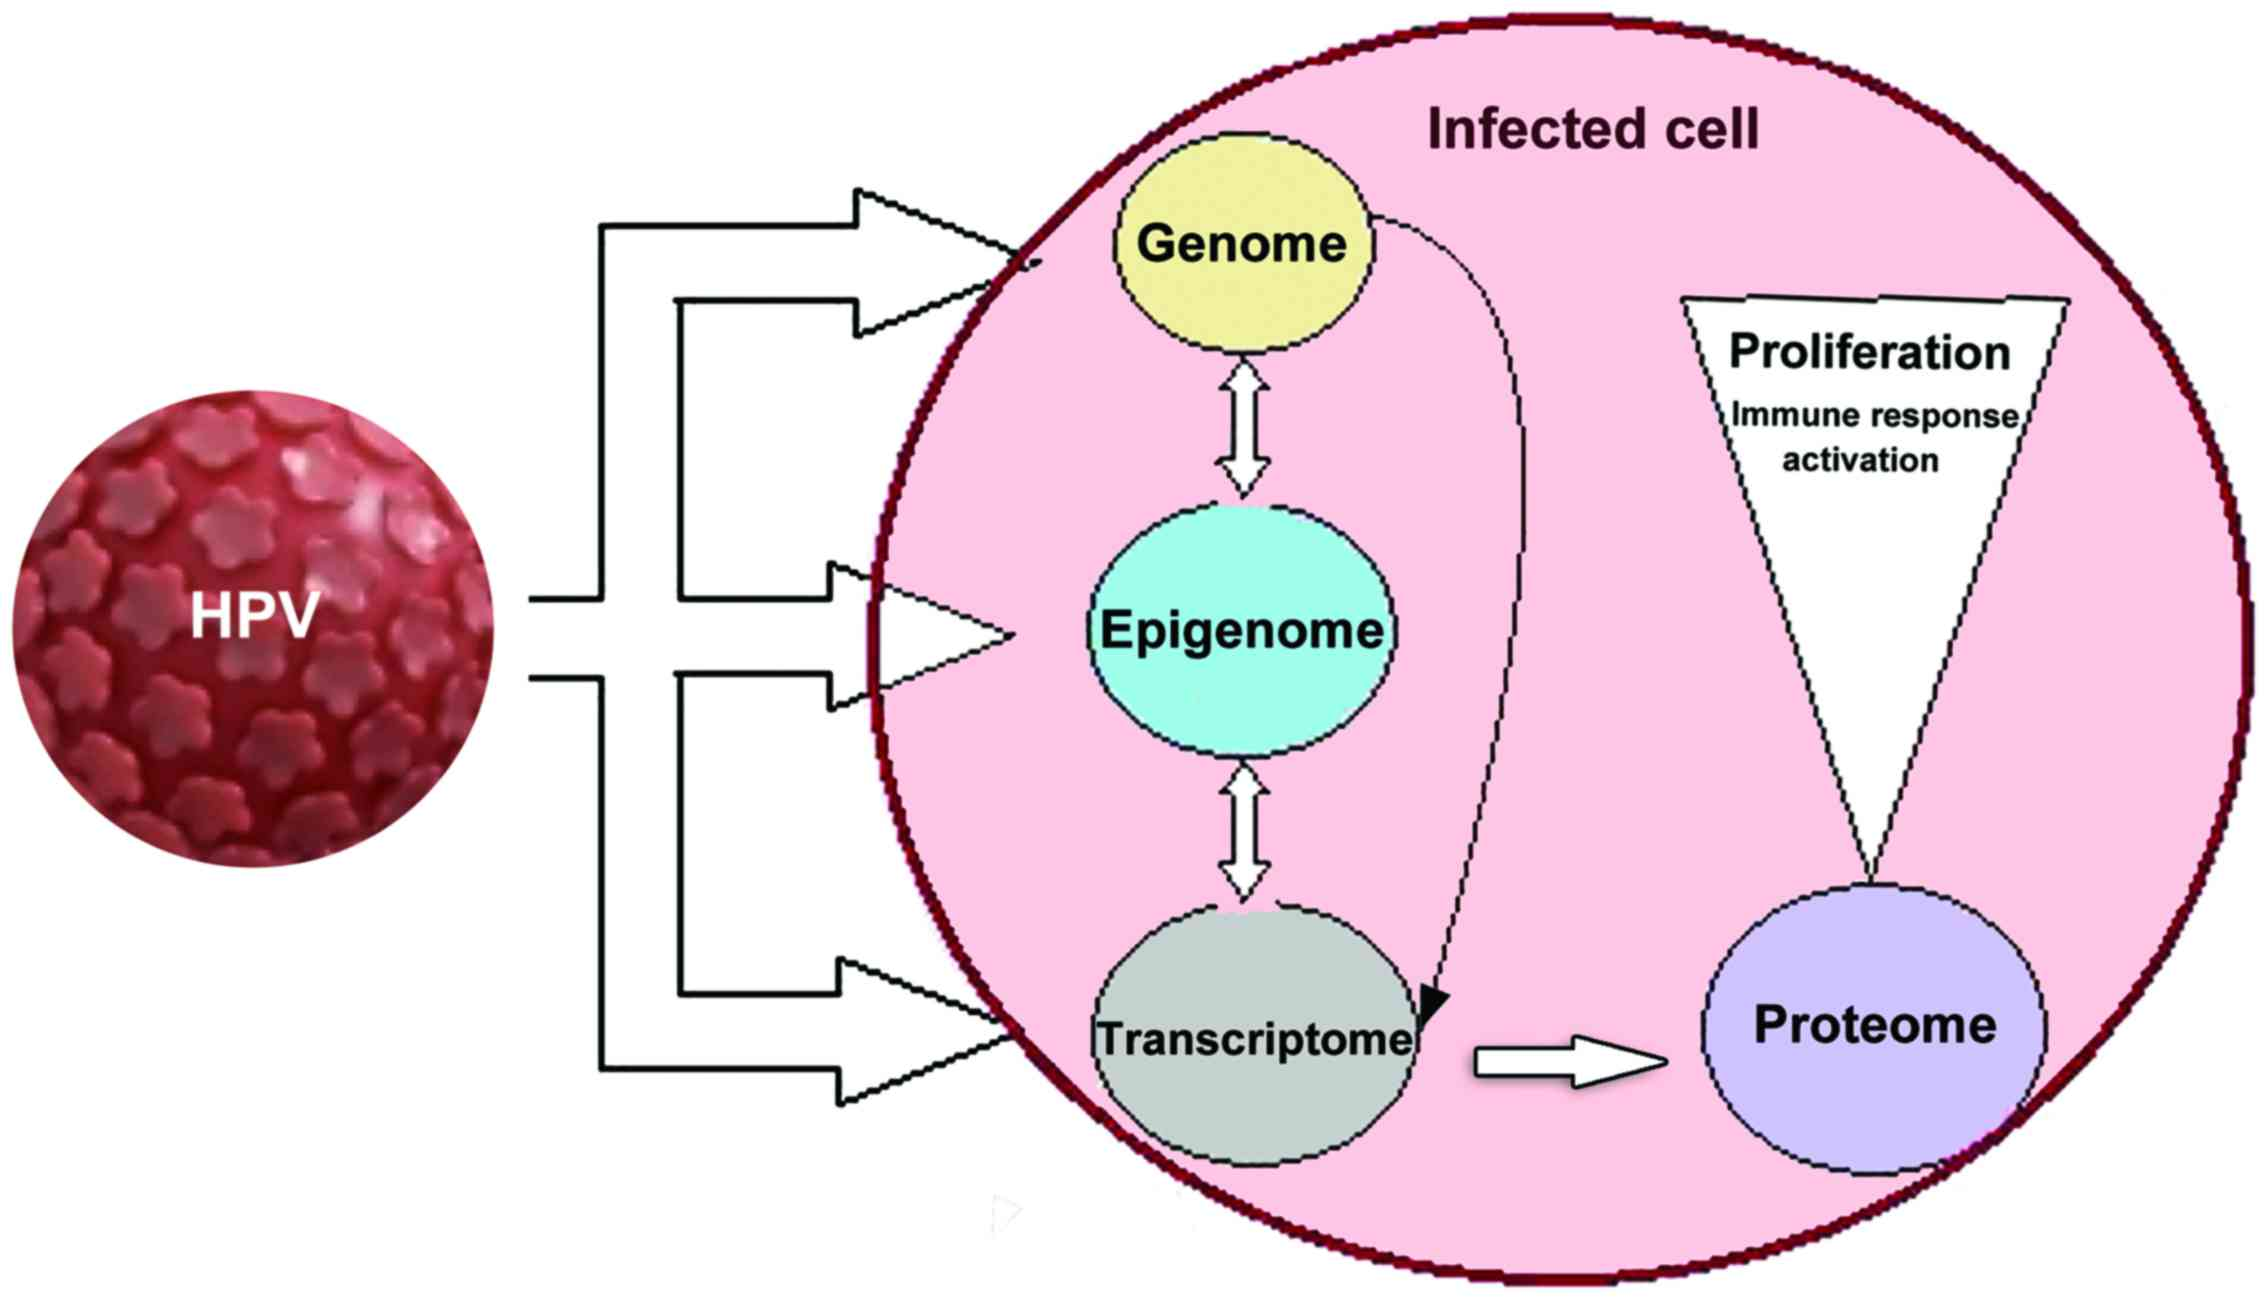 human papillomavirus especially strains 16 and 18)